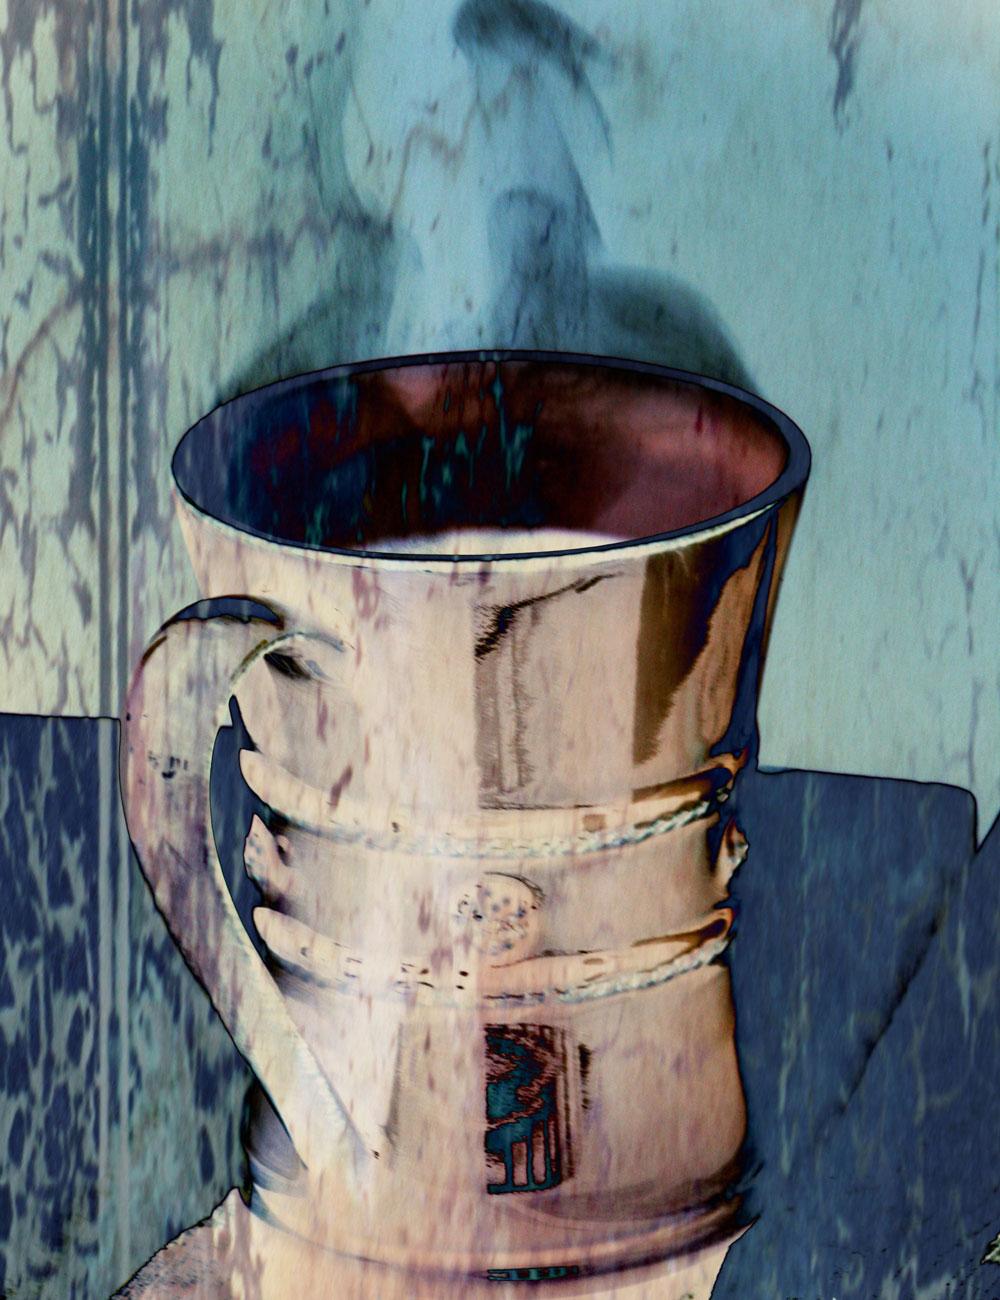 35_Teal-mug-edgy_rgb_opt_web.jpg